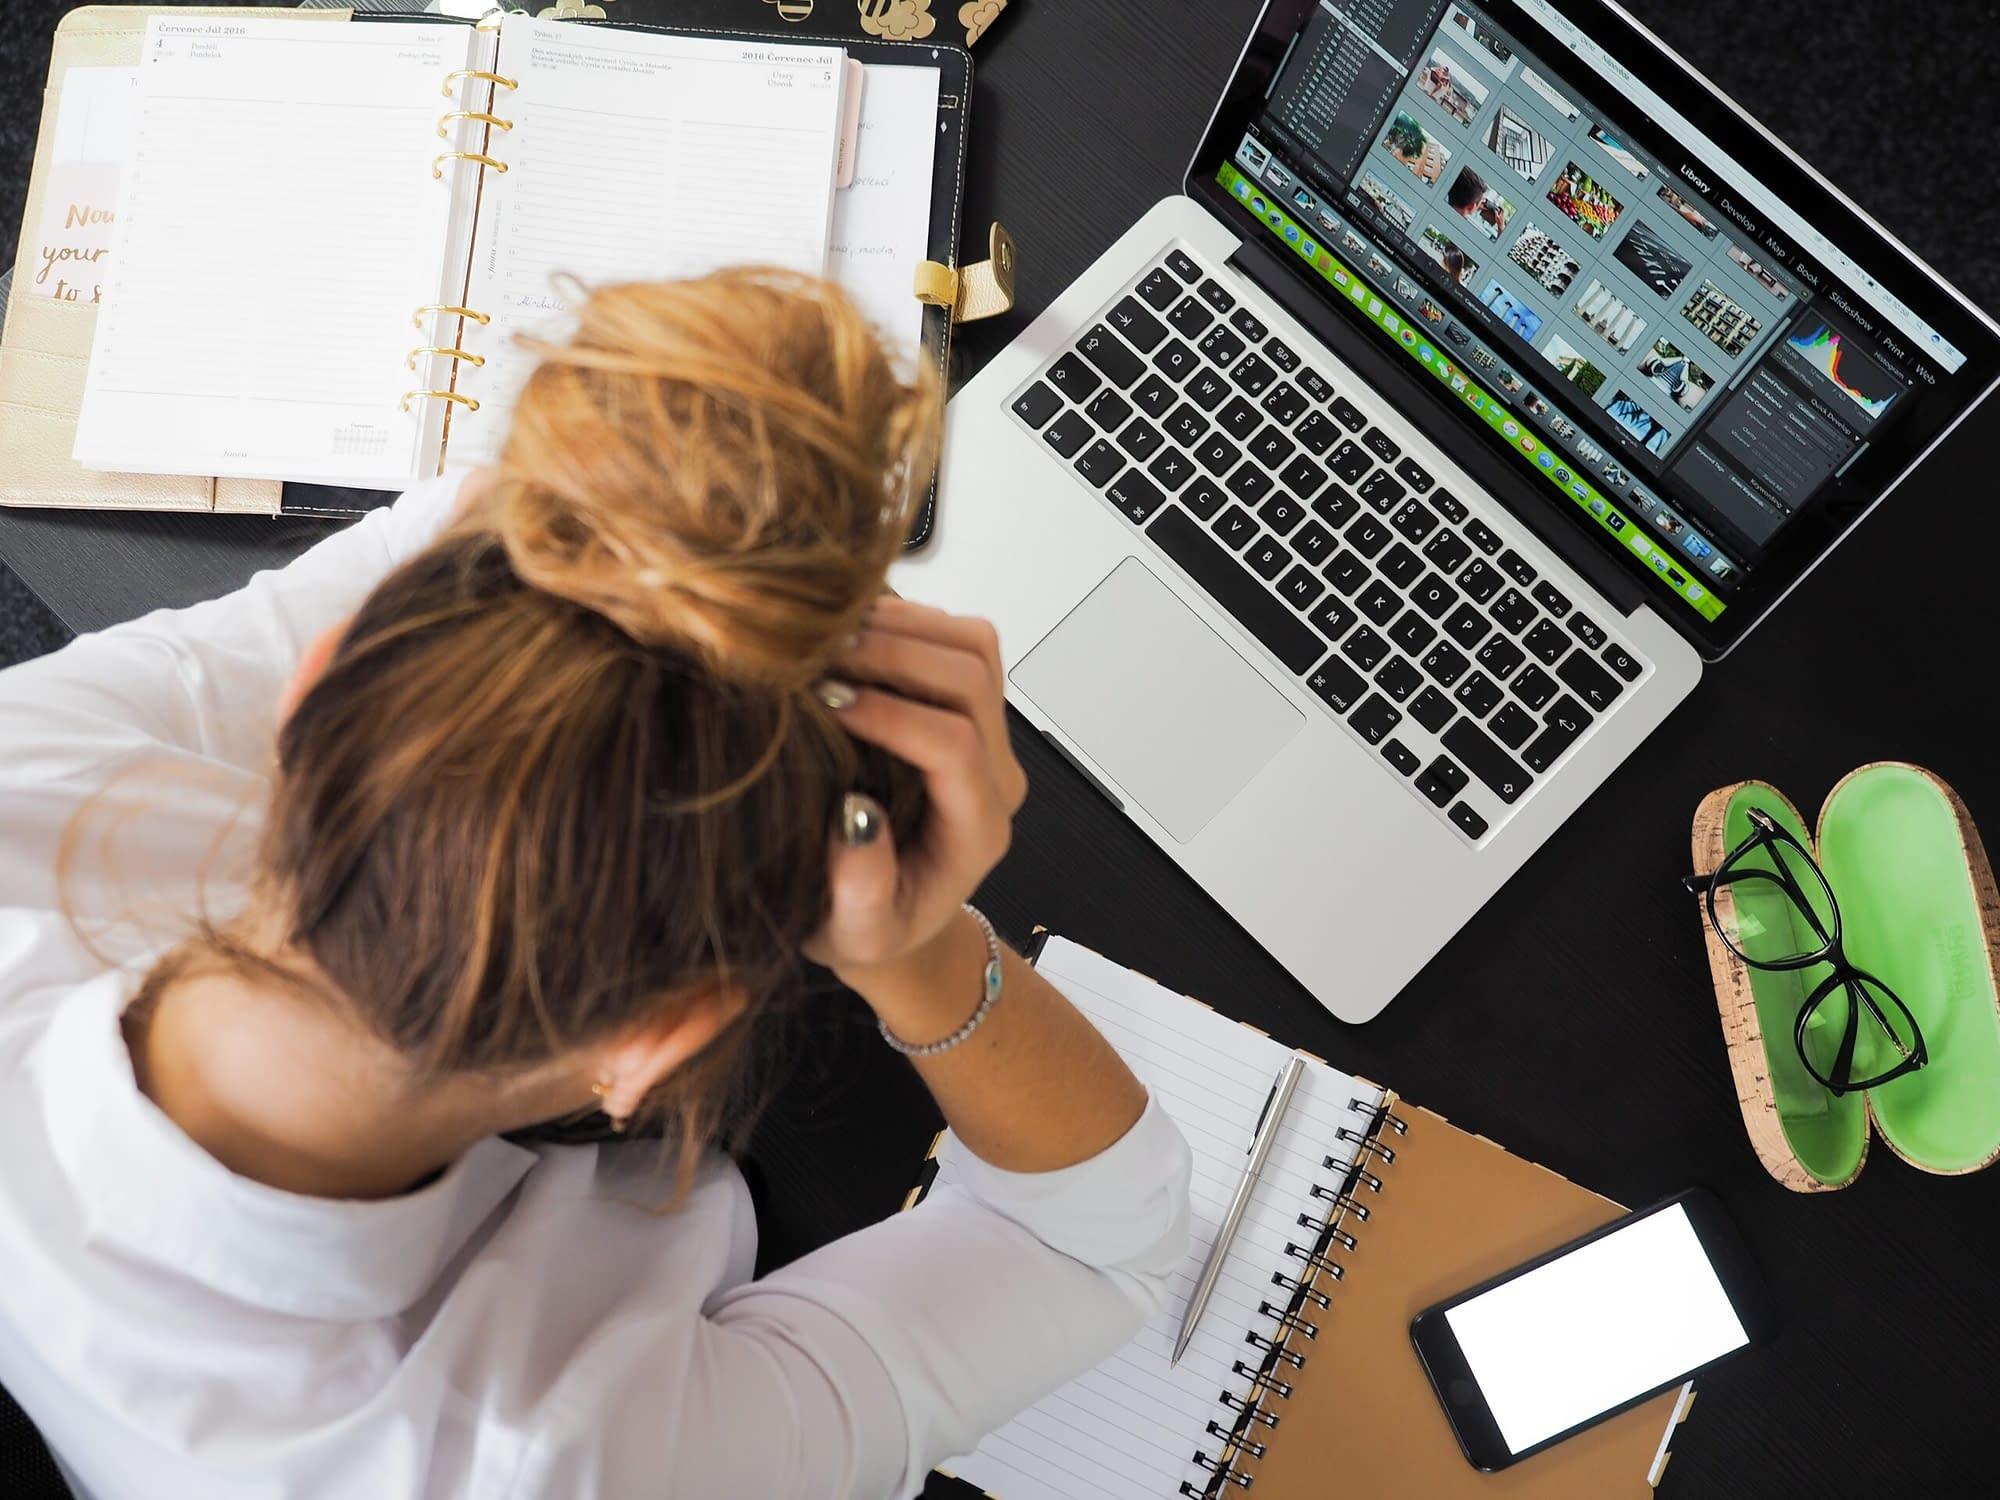 Foto av energepic.com från Pexels - se deadlinen i vitögat